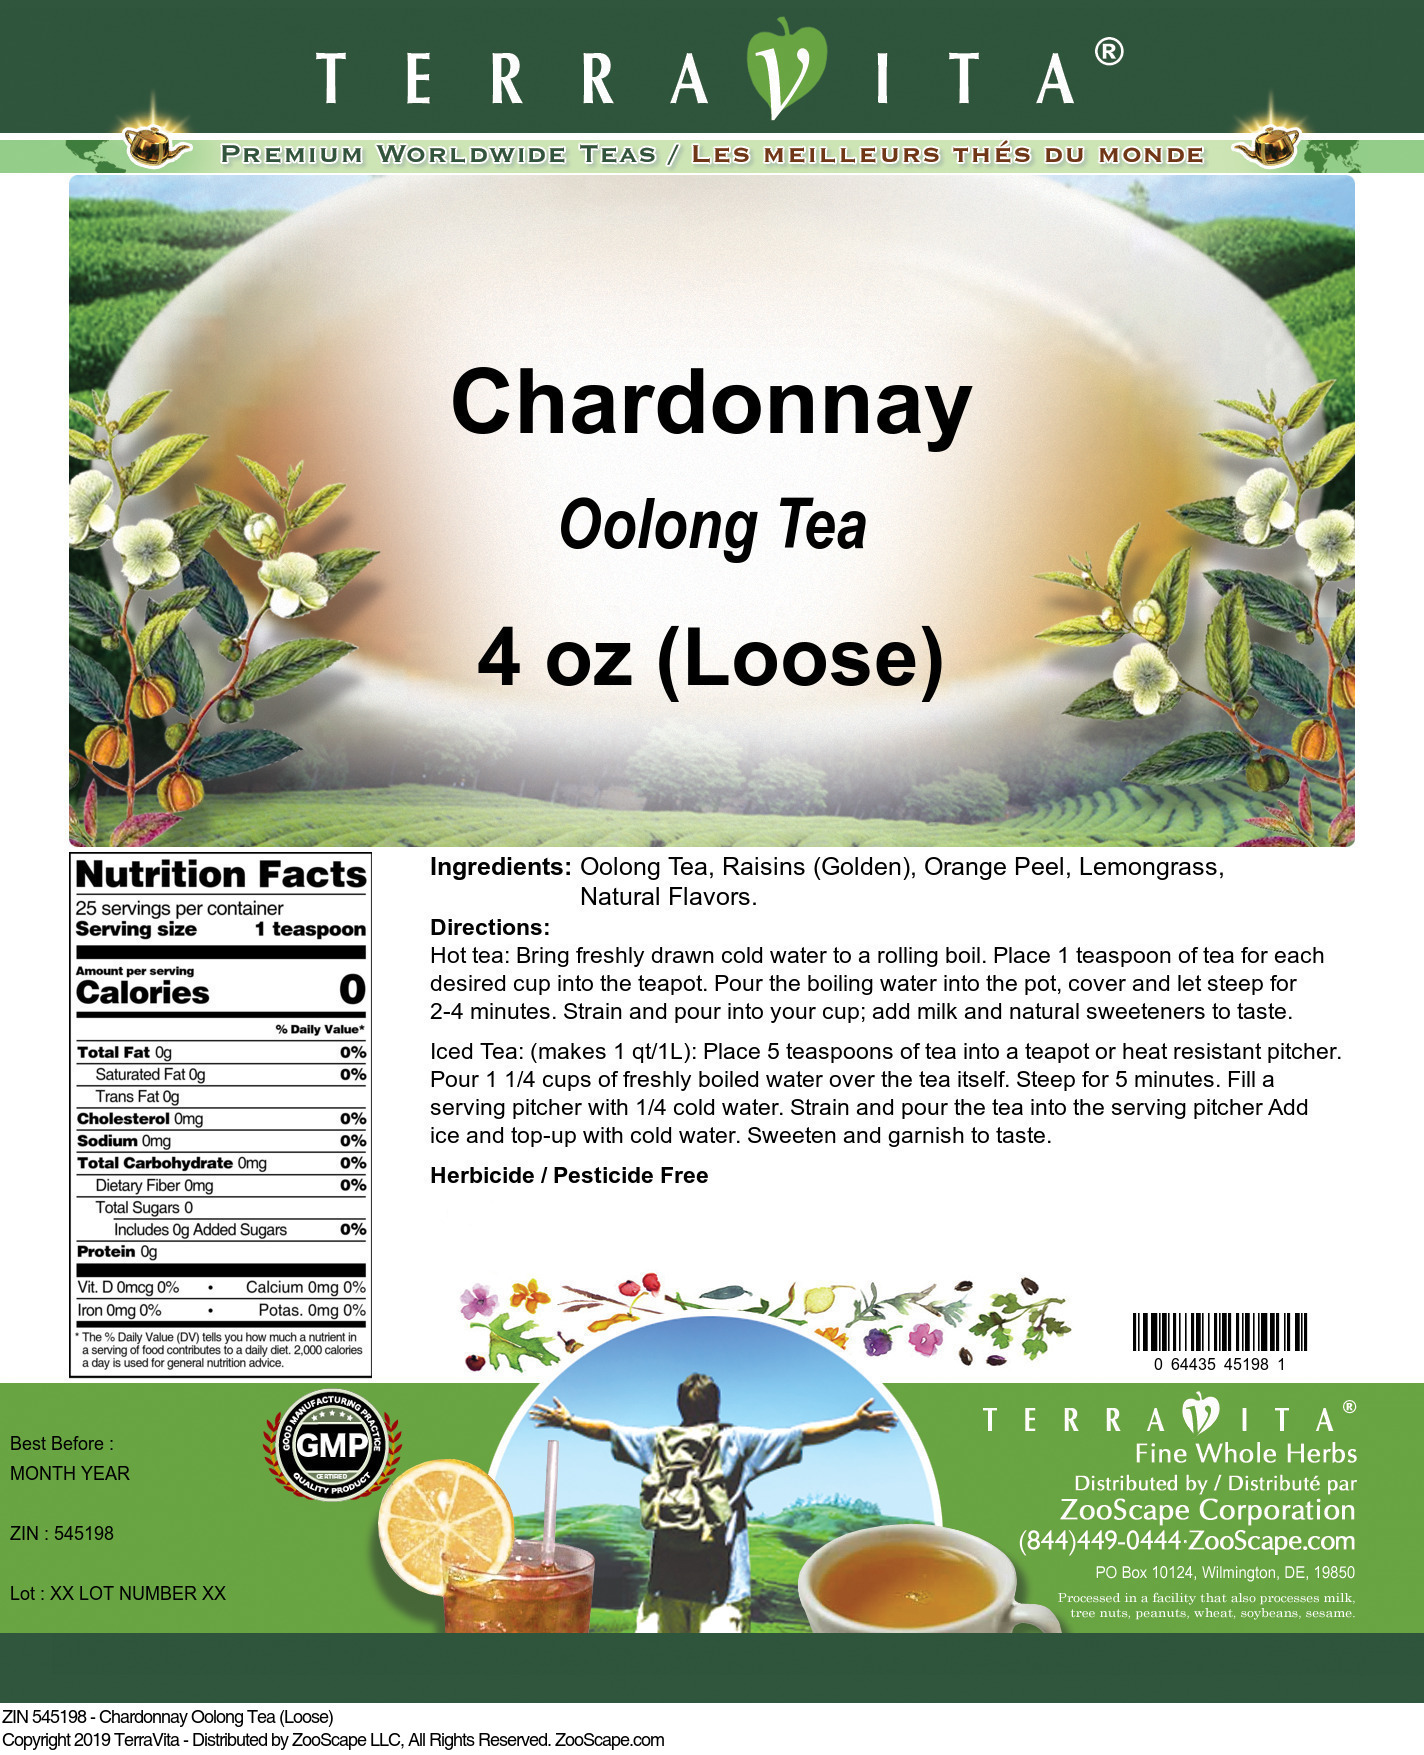 Chardonnay Oolong Tea (Loose)